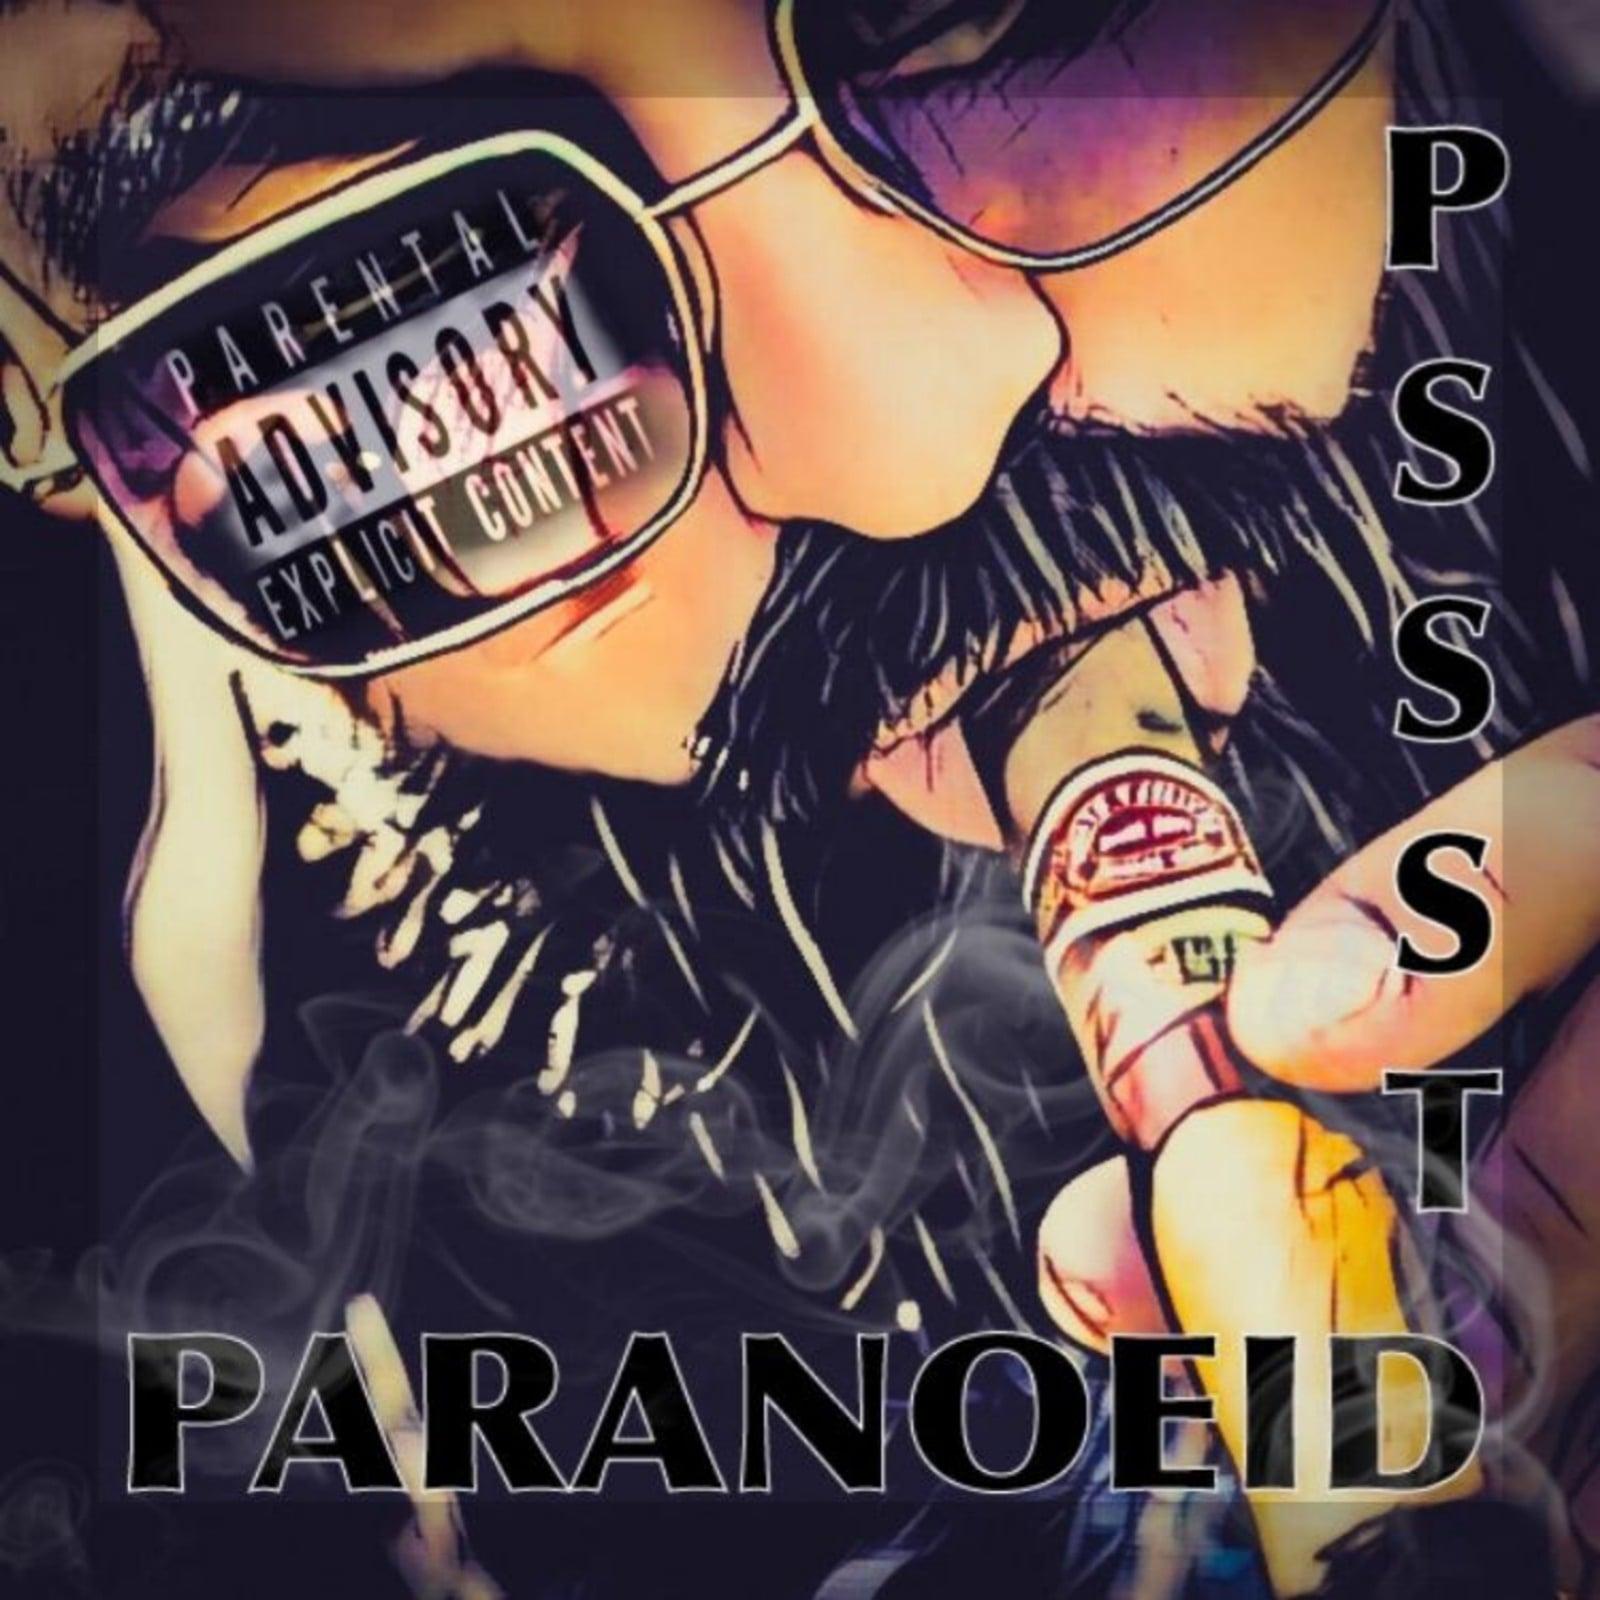 Upcoming: Paranoeid - Pssst